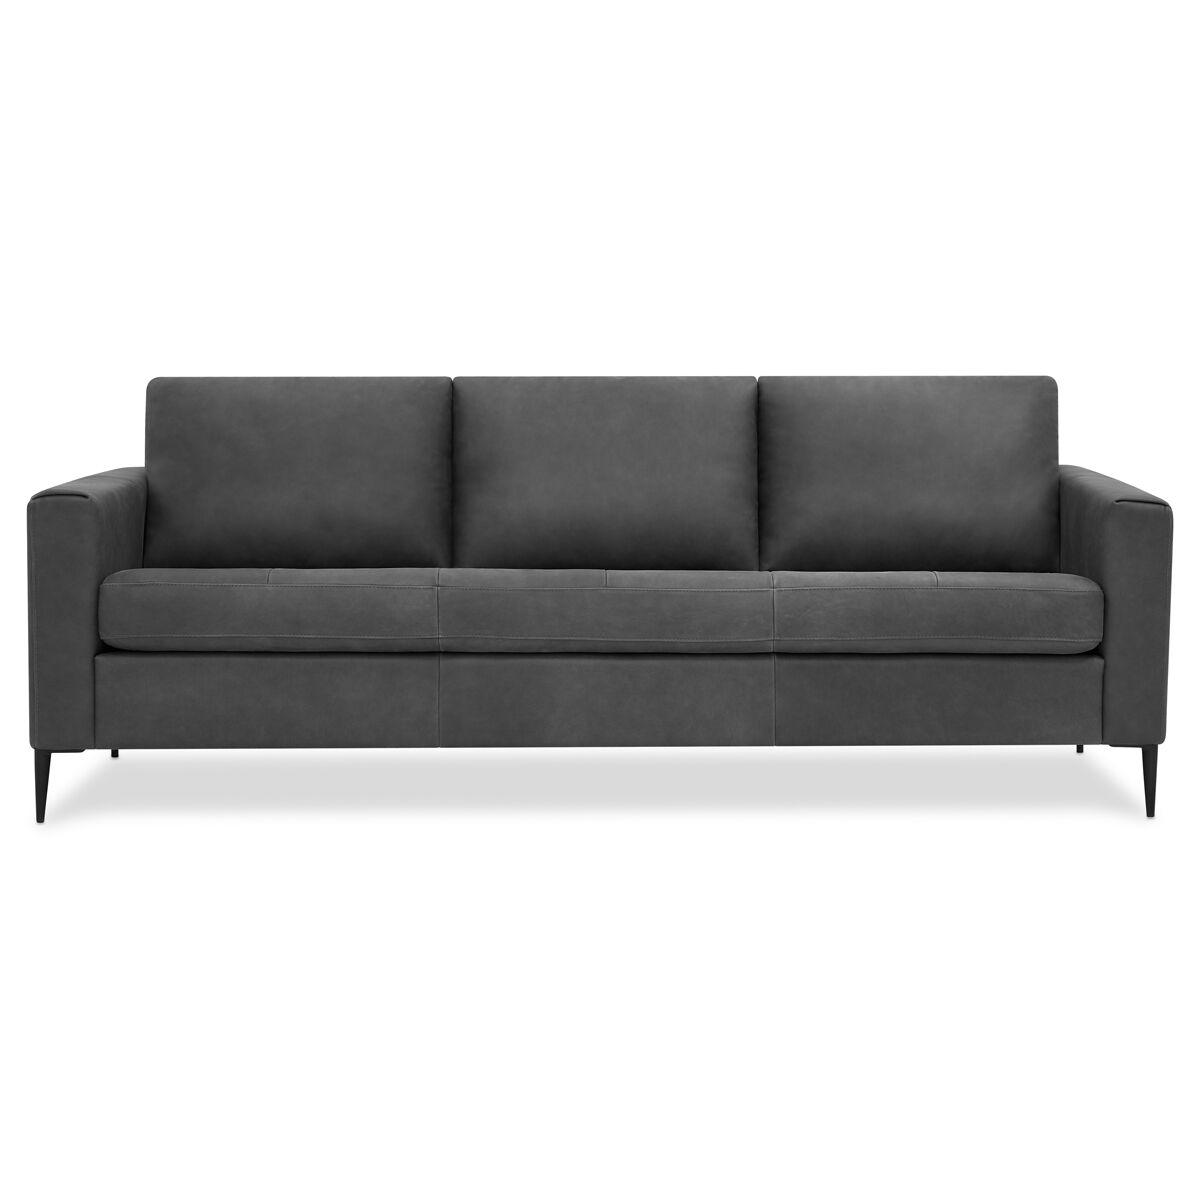 emma tufted sofa beautiful sofas designs living urban barn lucca leather attica slate